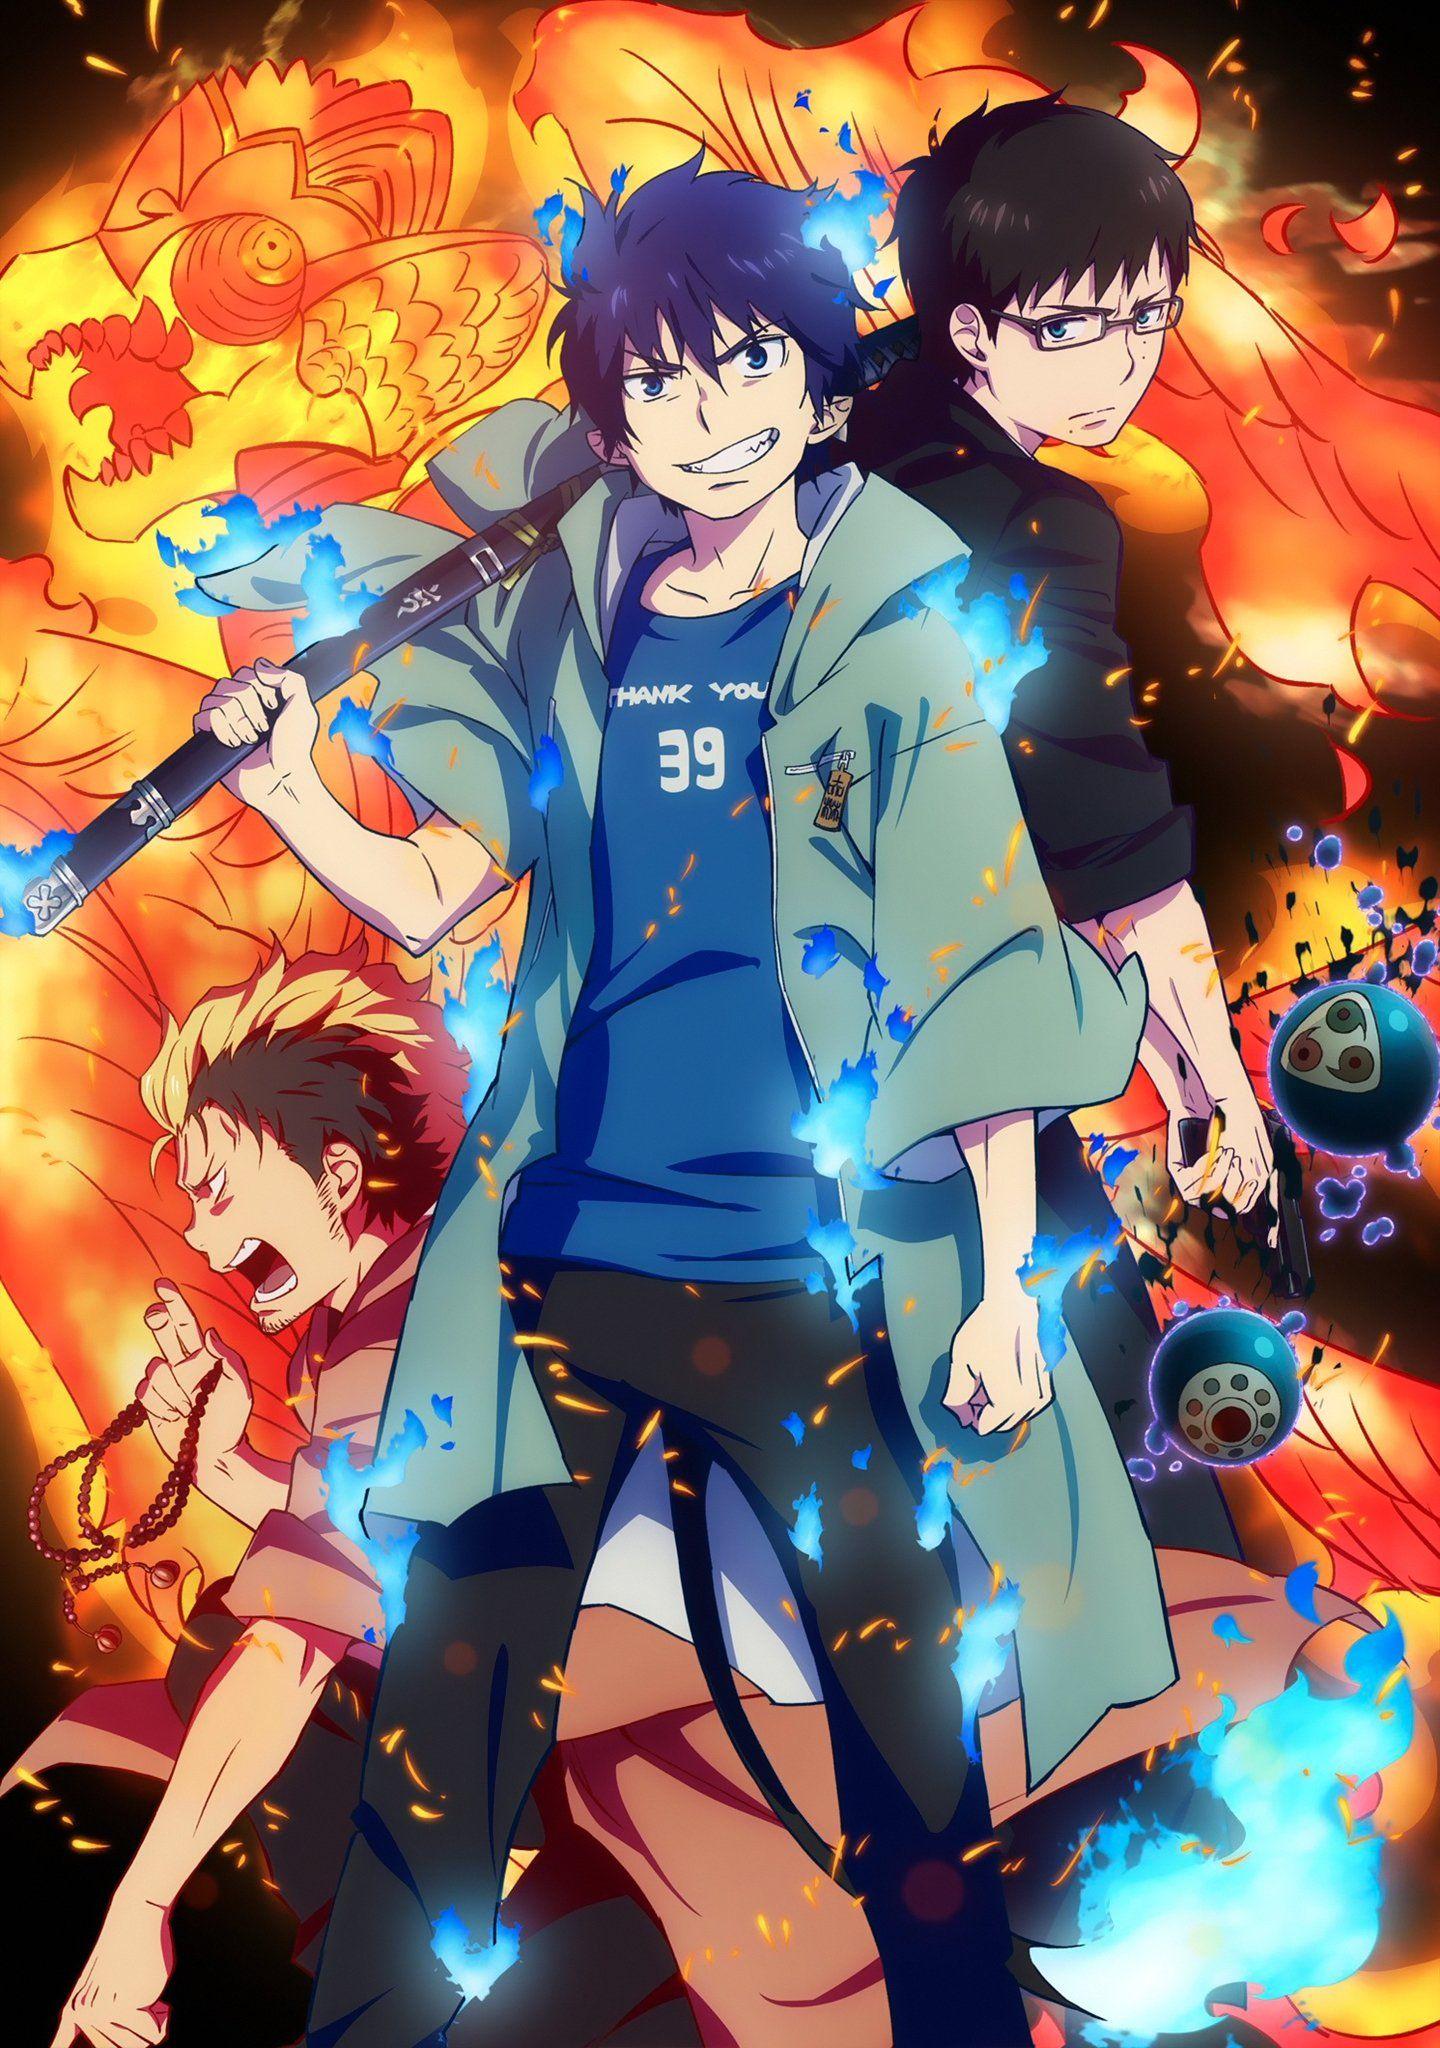 Rin, Yukio and Suguro Blue Exorcist anime manga